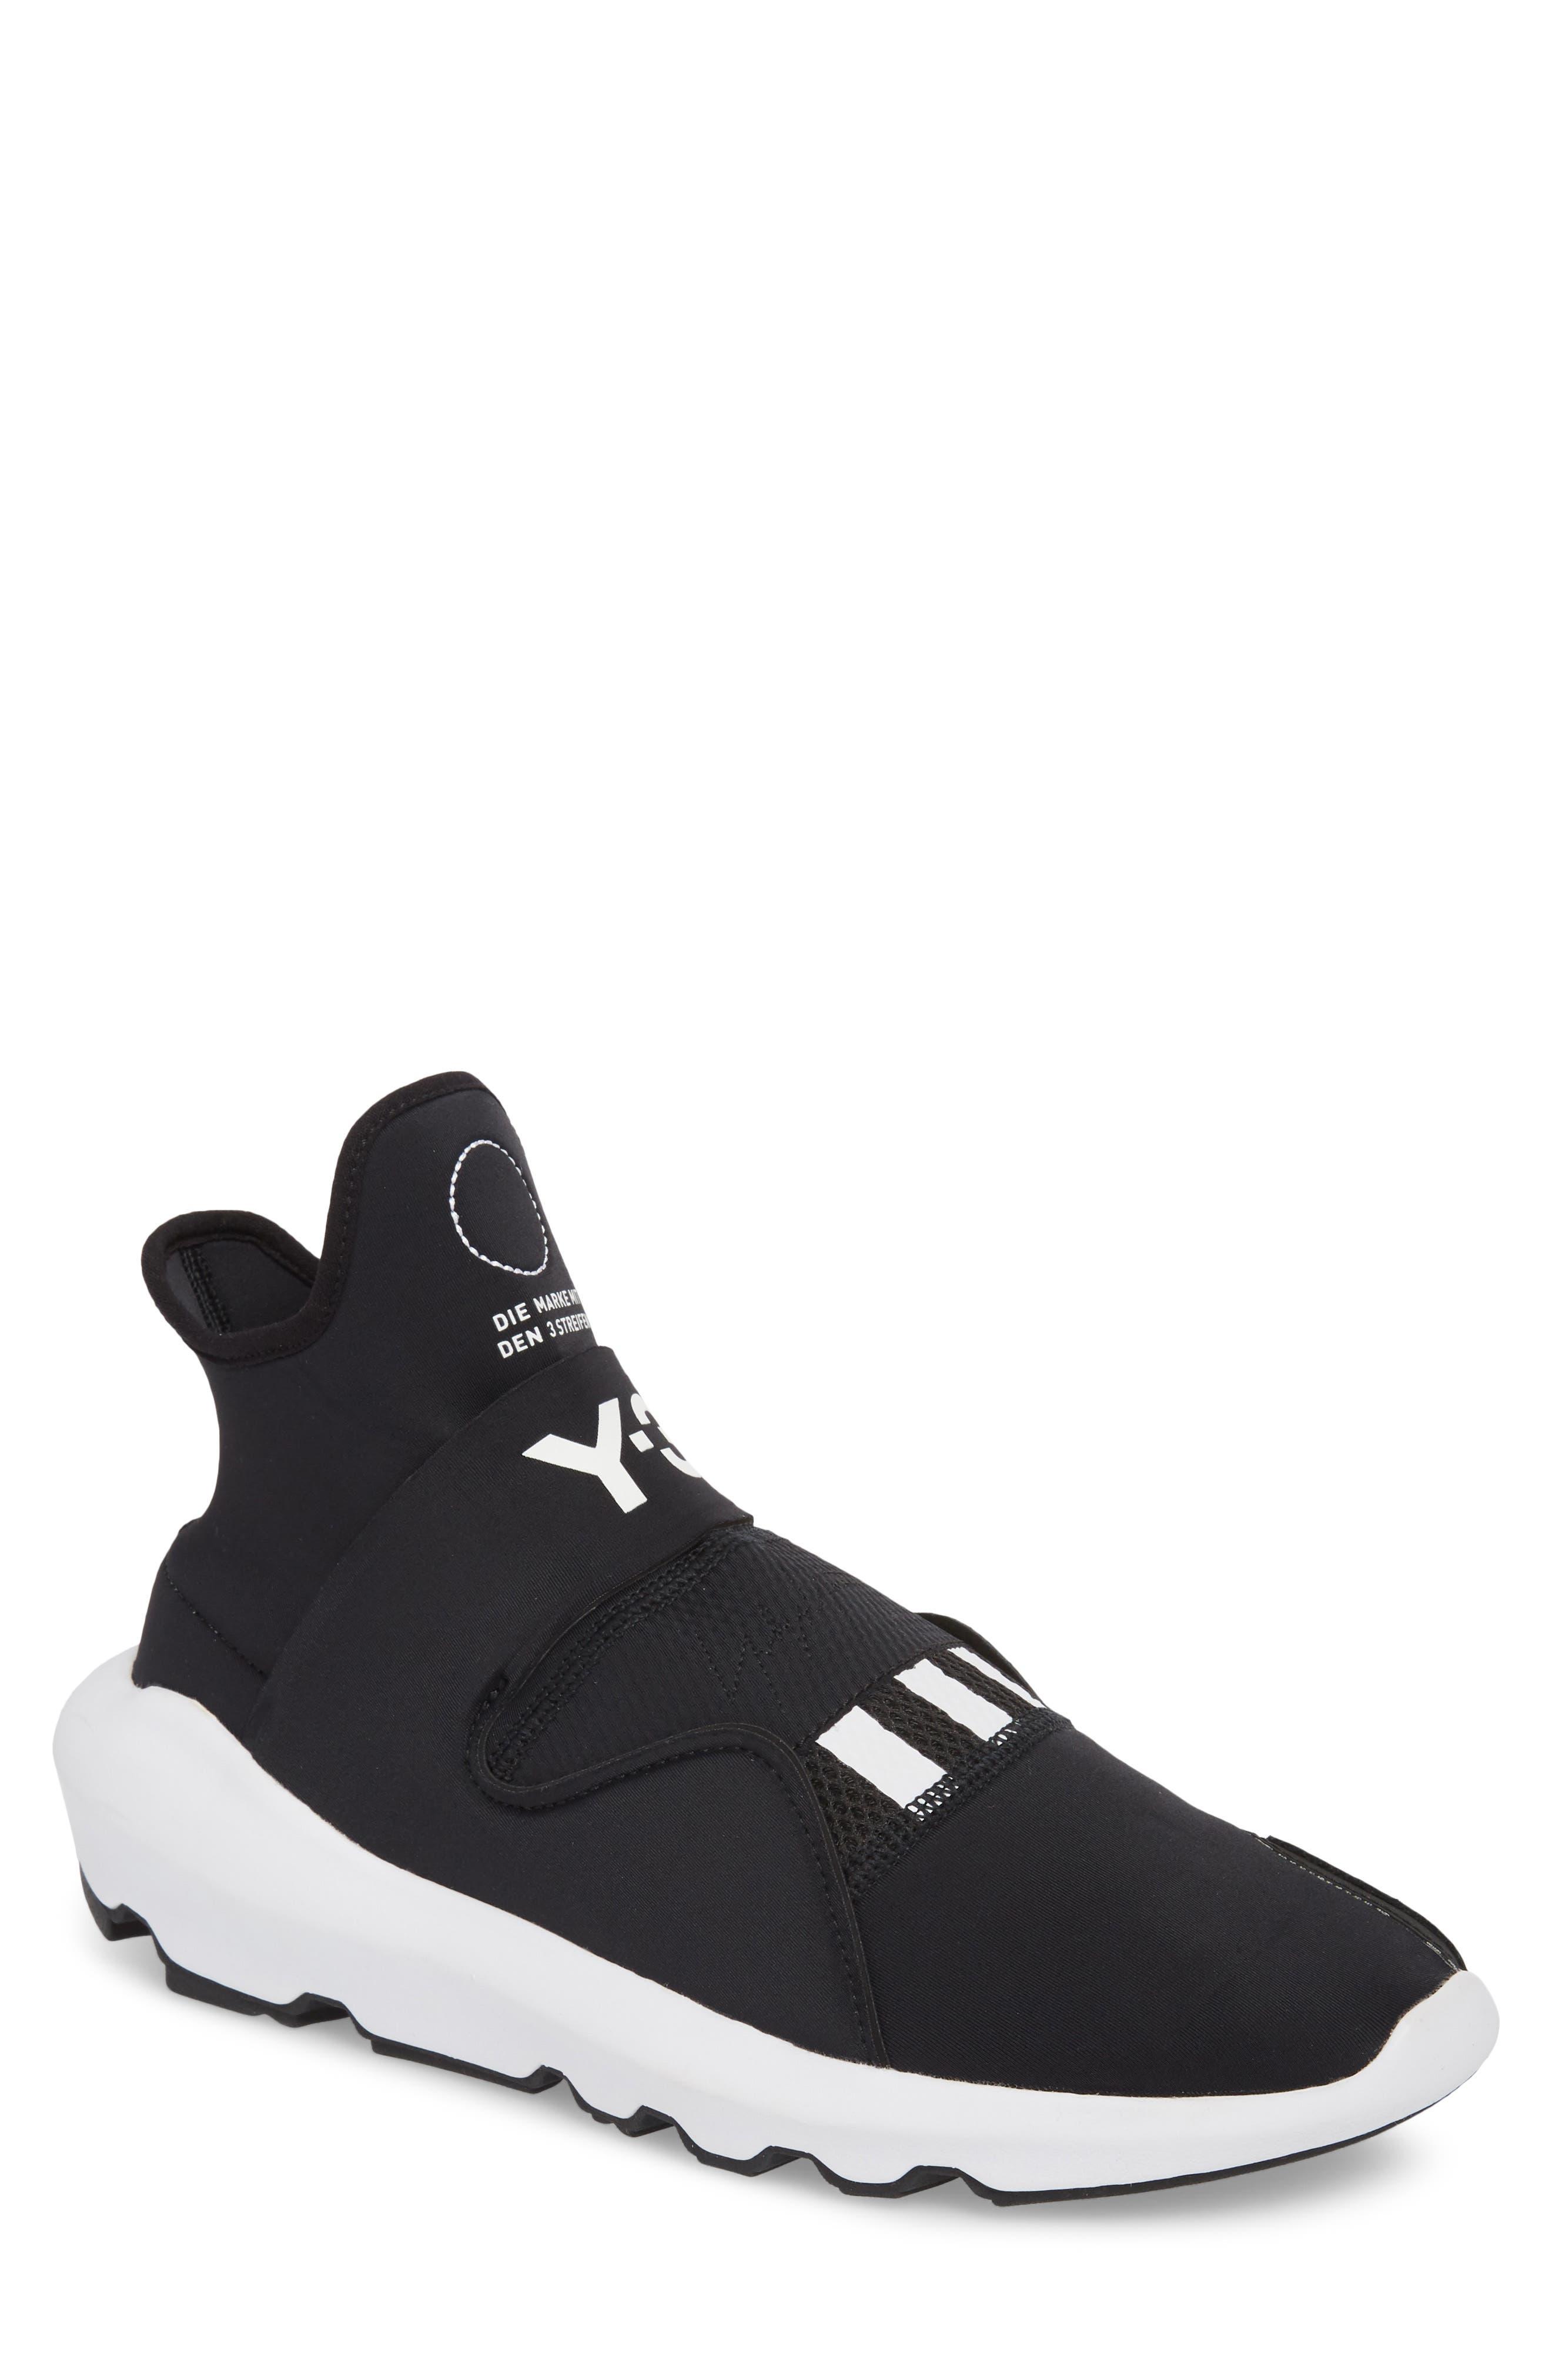 x adidas Suberou Sneaker,                         Main,                         color, 010